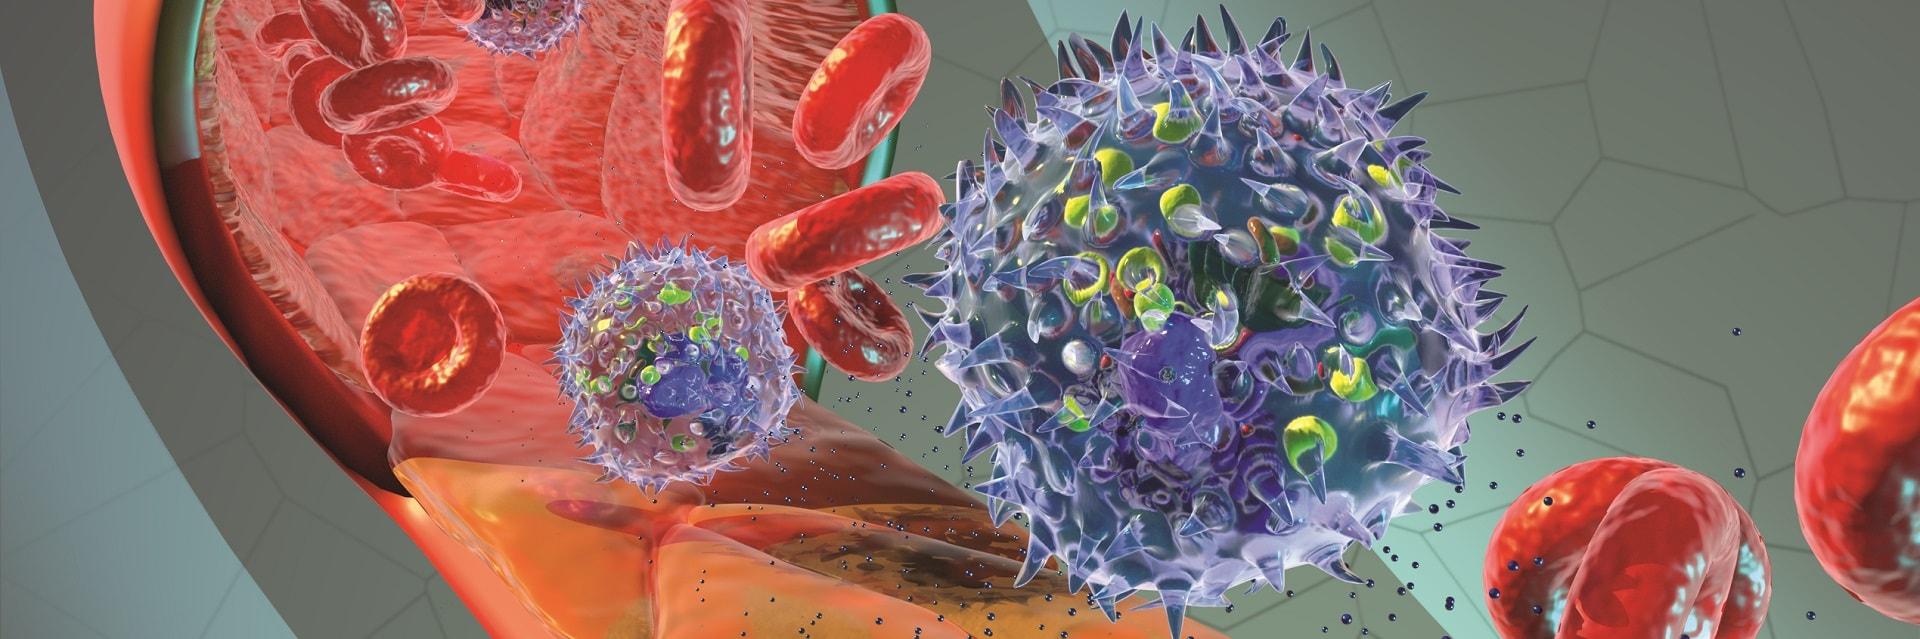 microfluidics-sepsis